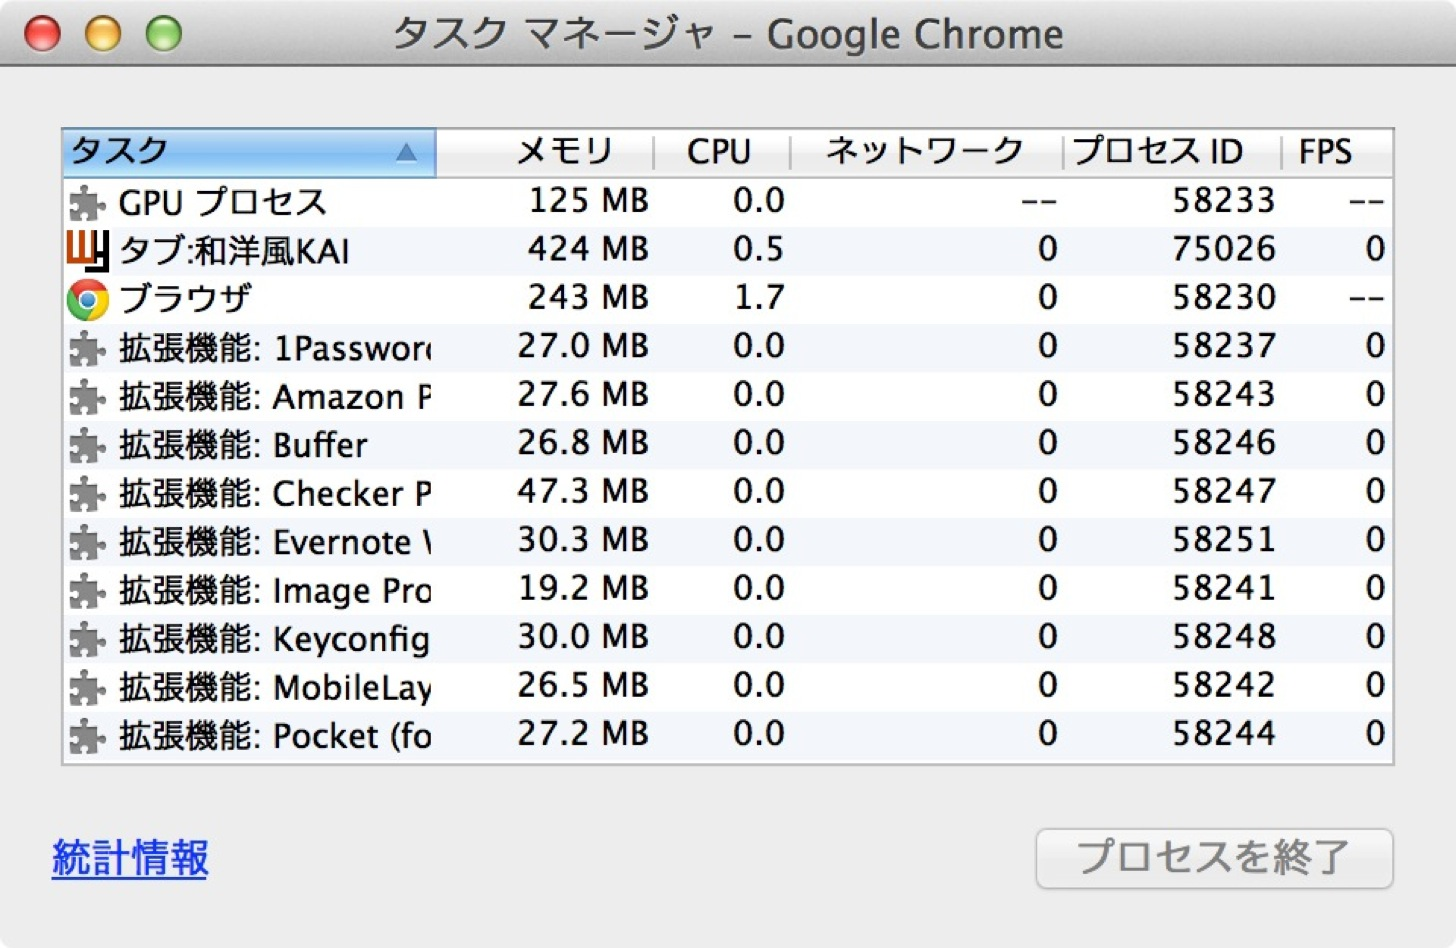 Google Chromeのタスクマネージャー